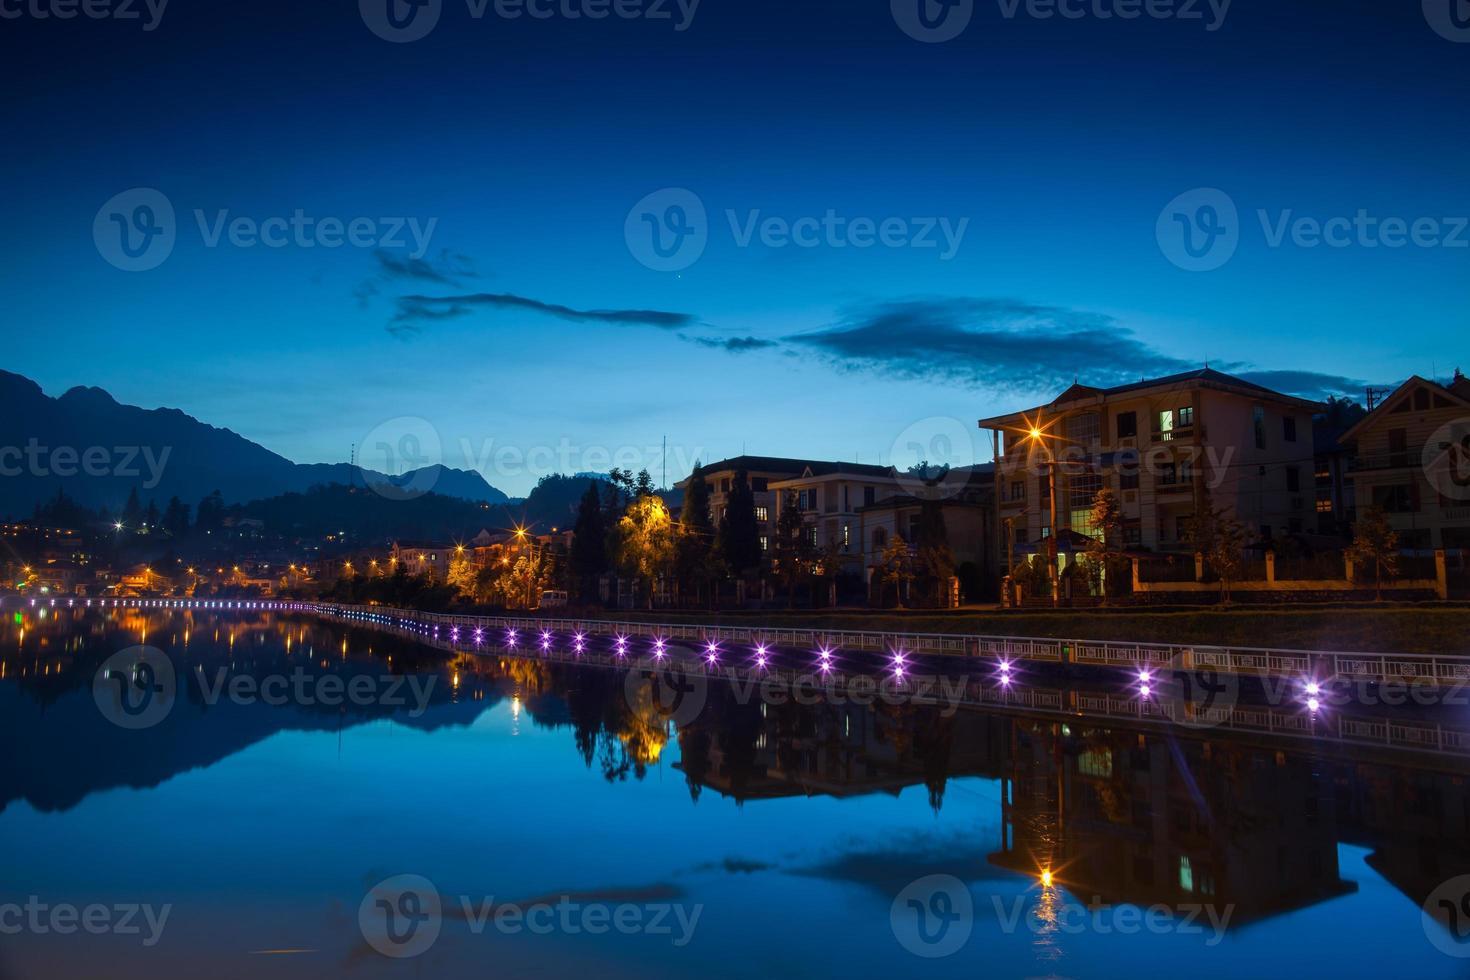 luci lungo l'acqua di notte foto